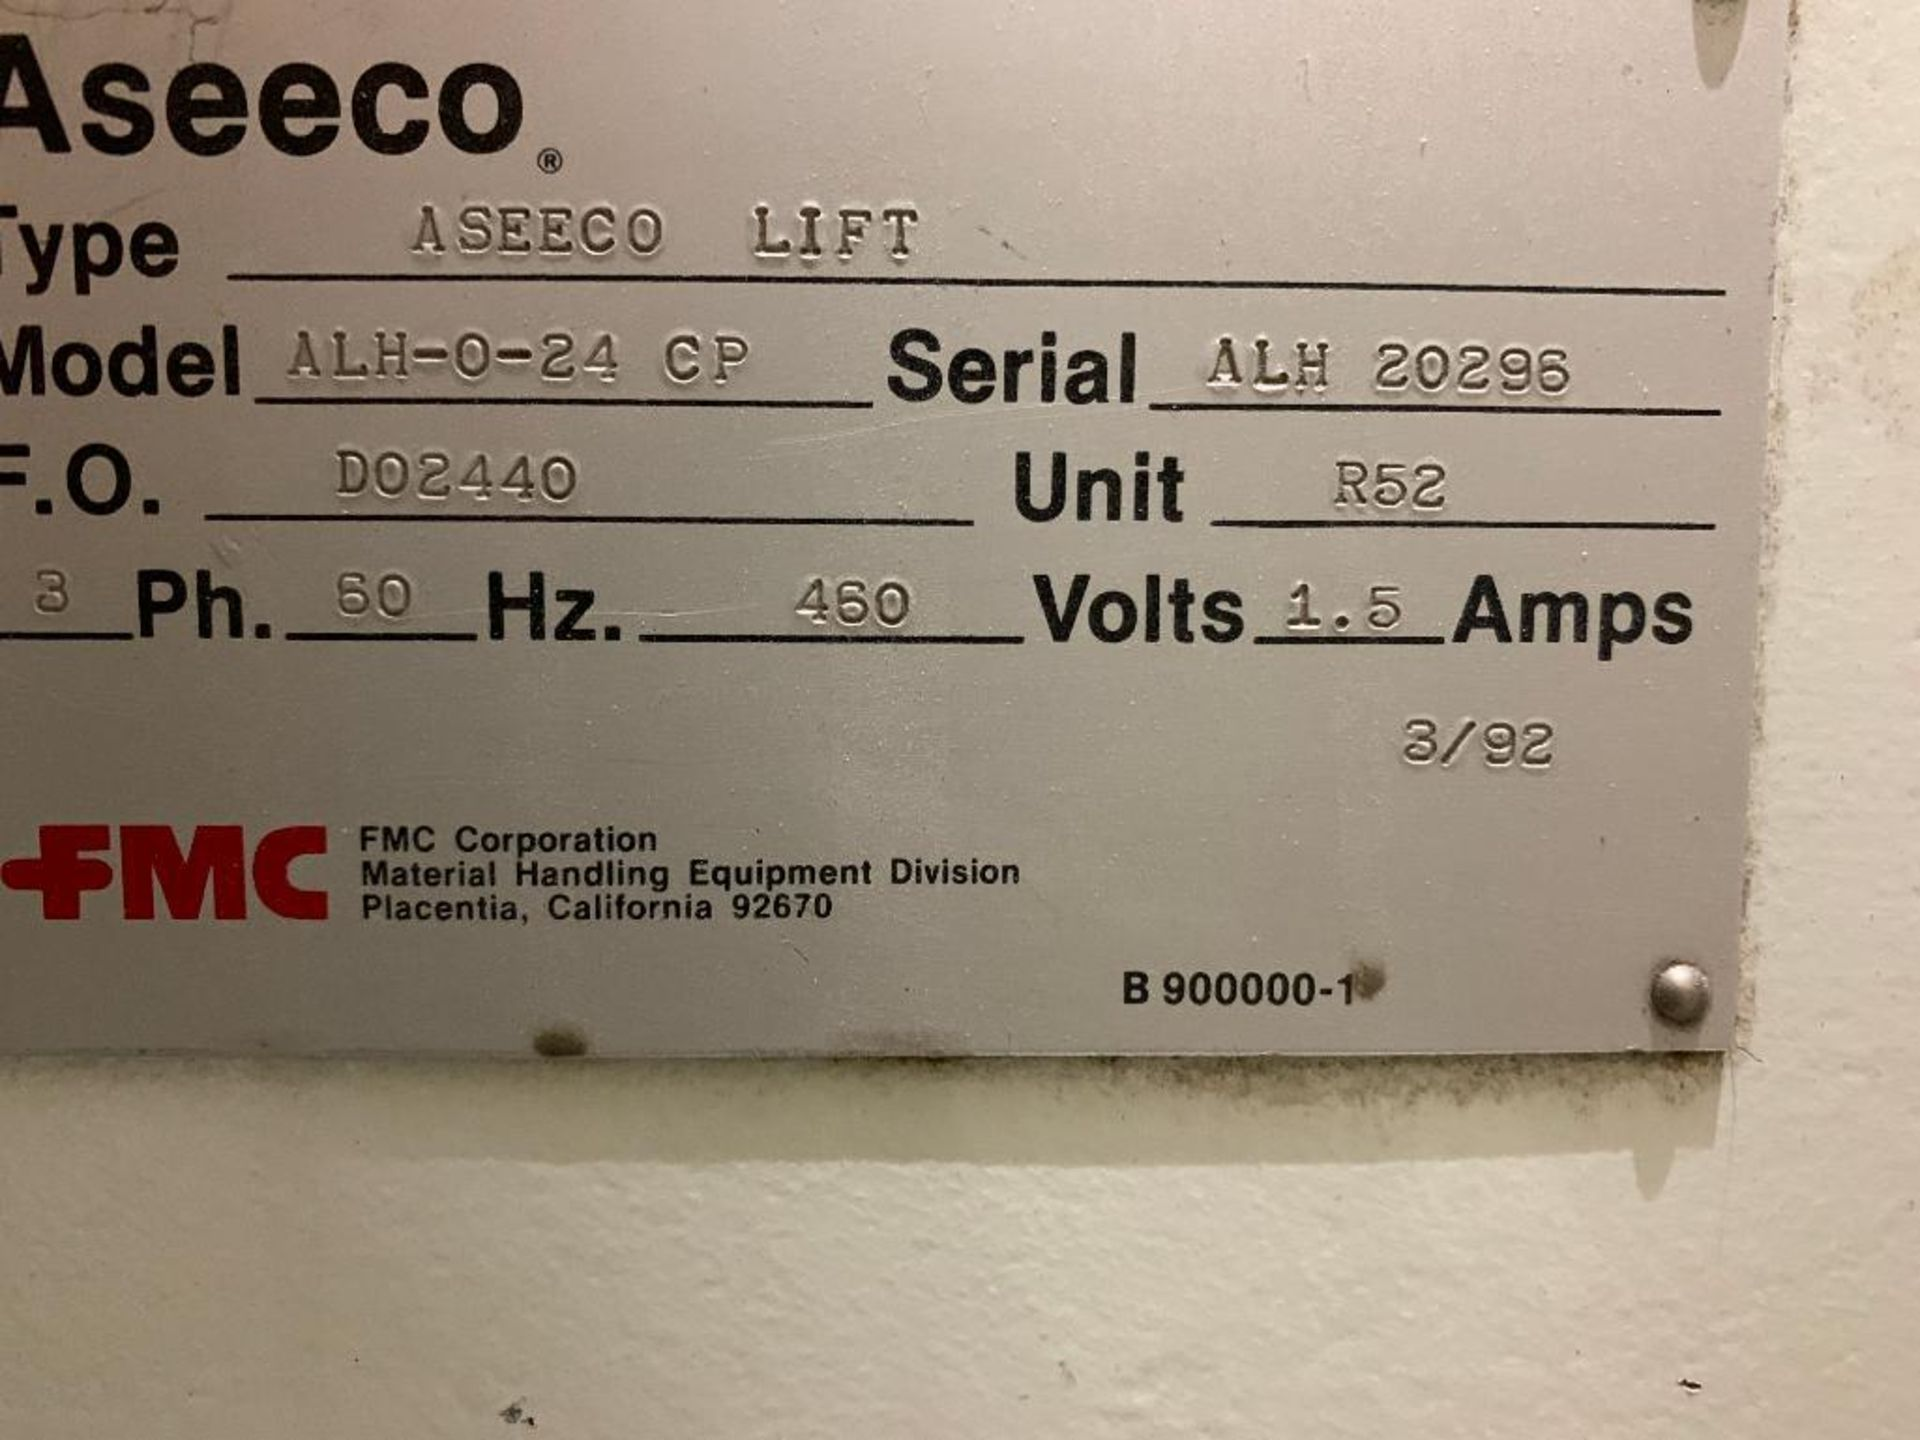 1990 Aseeco horizontal bucket elevator, model ALH-0-24 - Image 15 of 16